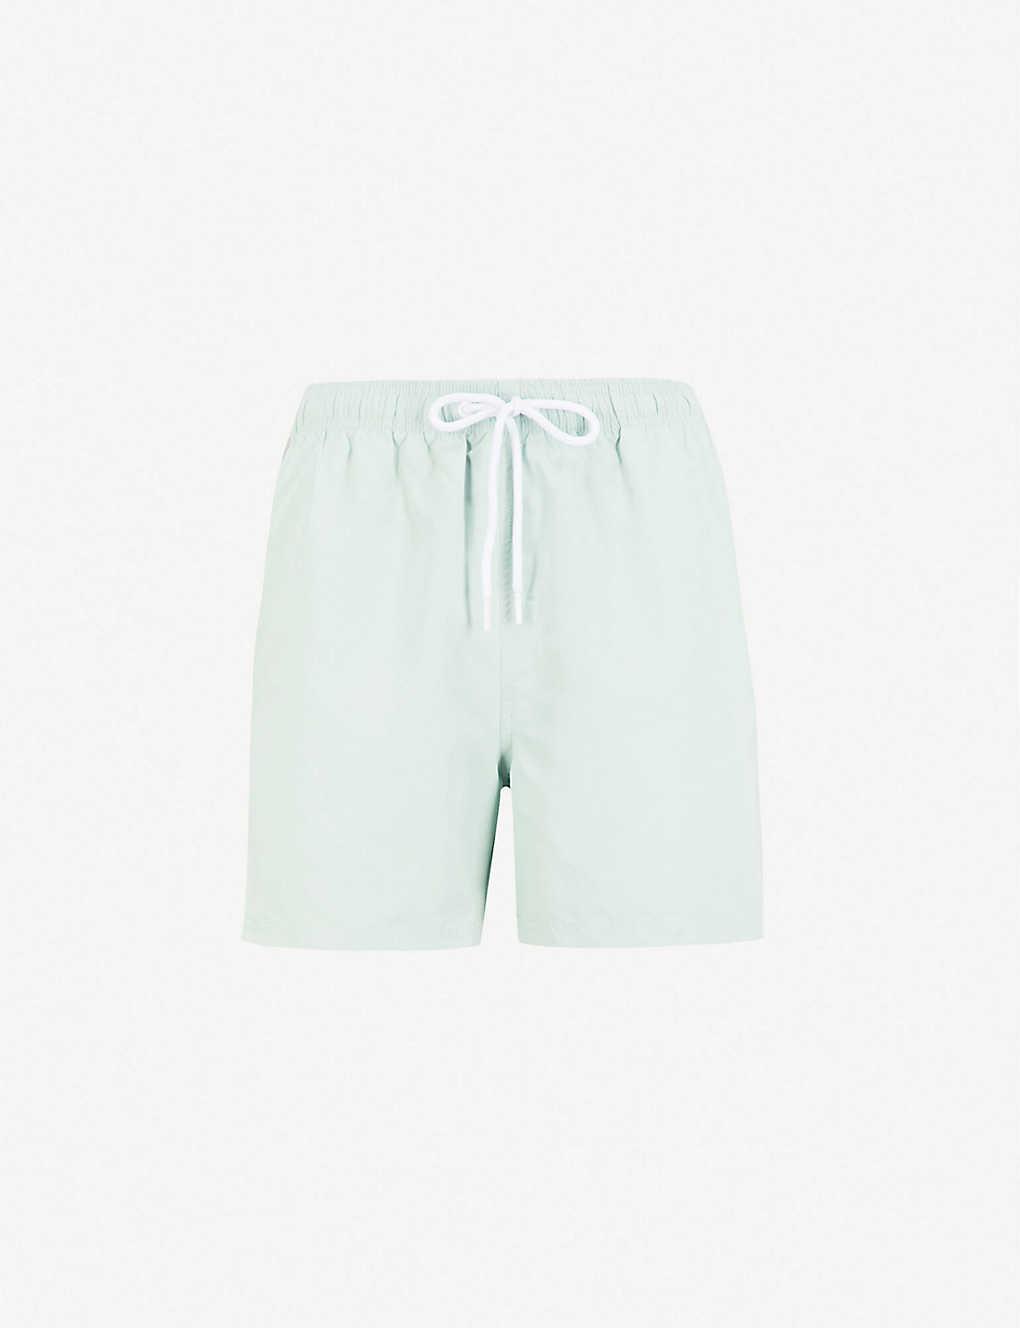 975dd9c6308ad REISS - Sonar swim shorts   Selfridges.com